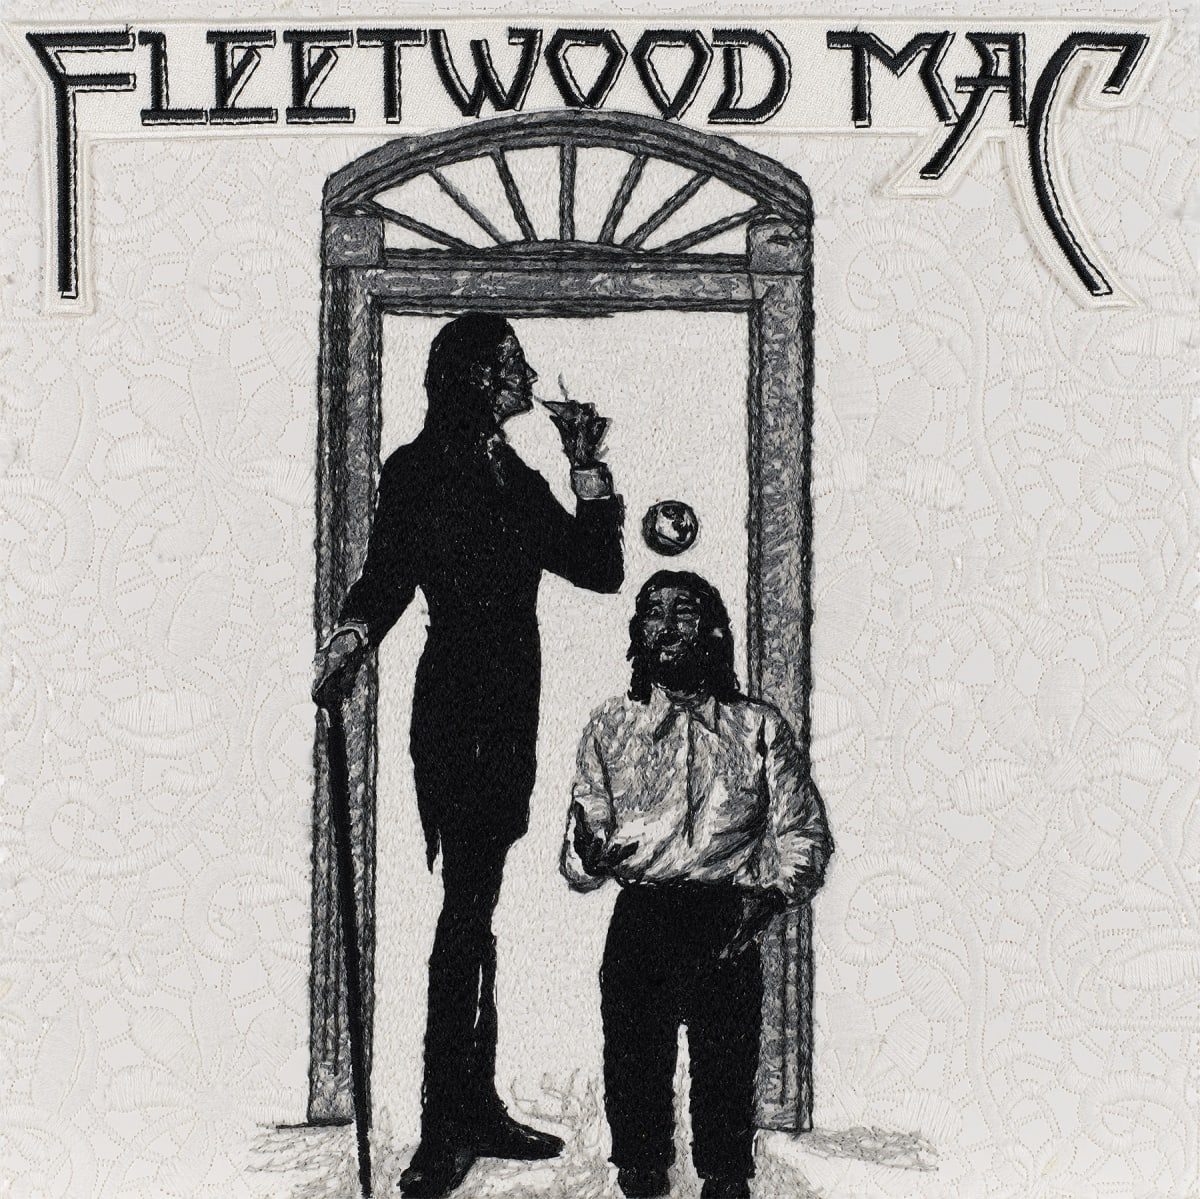 Stephen Wilson, Fleetwood Mac , 2020